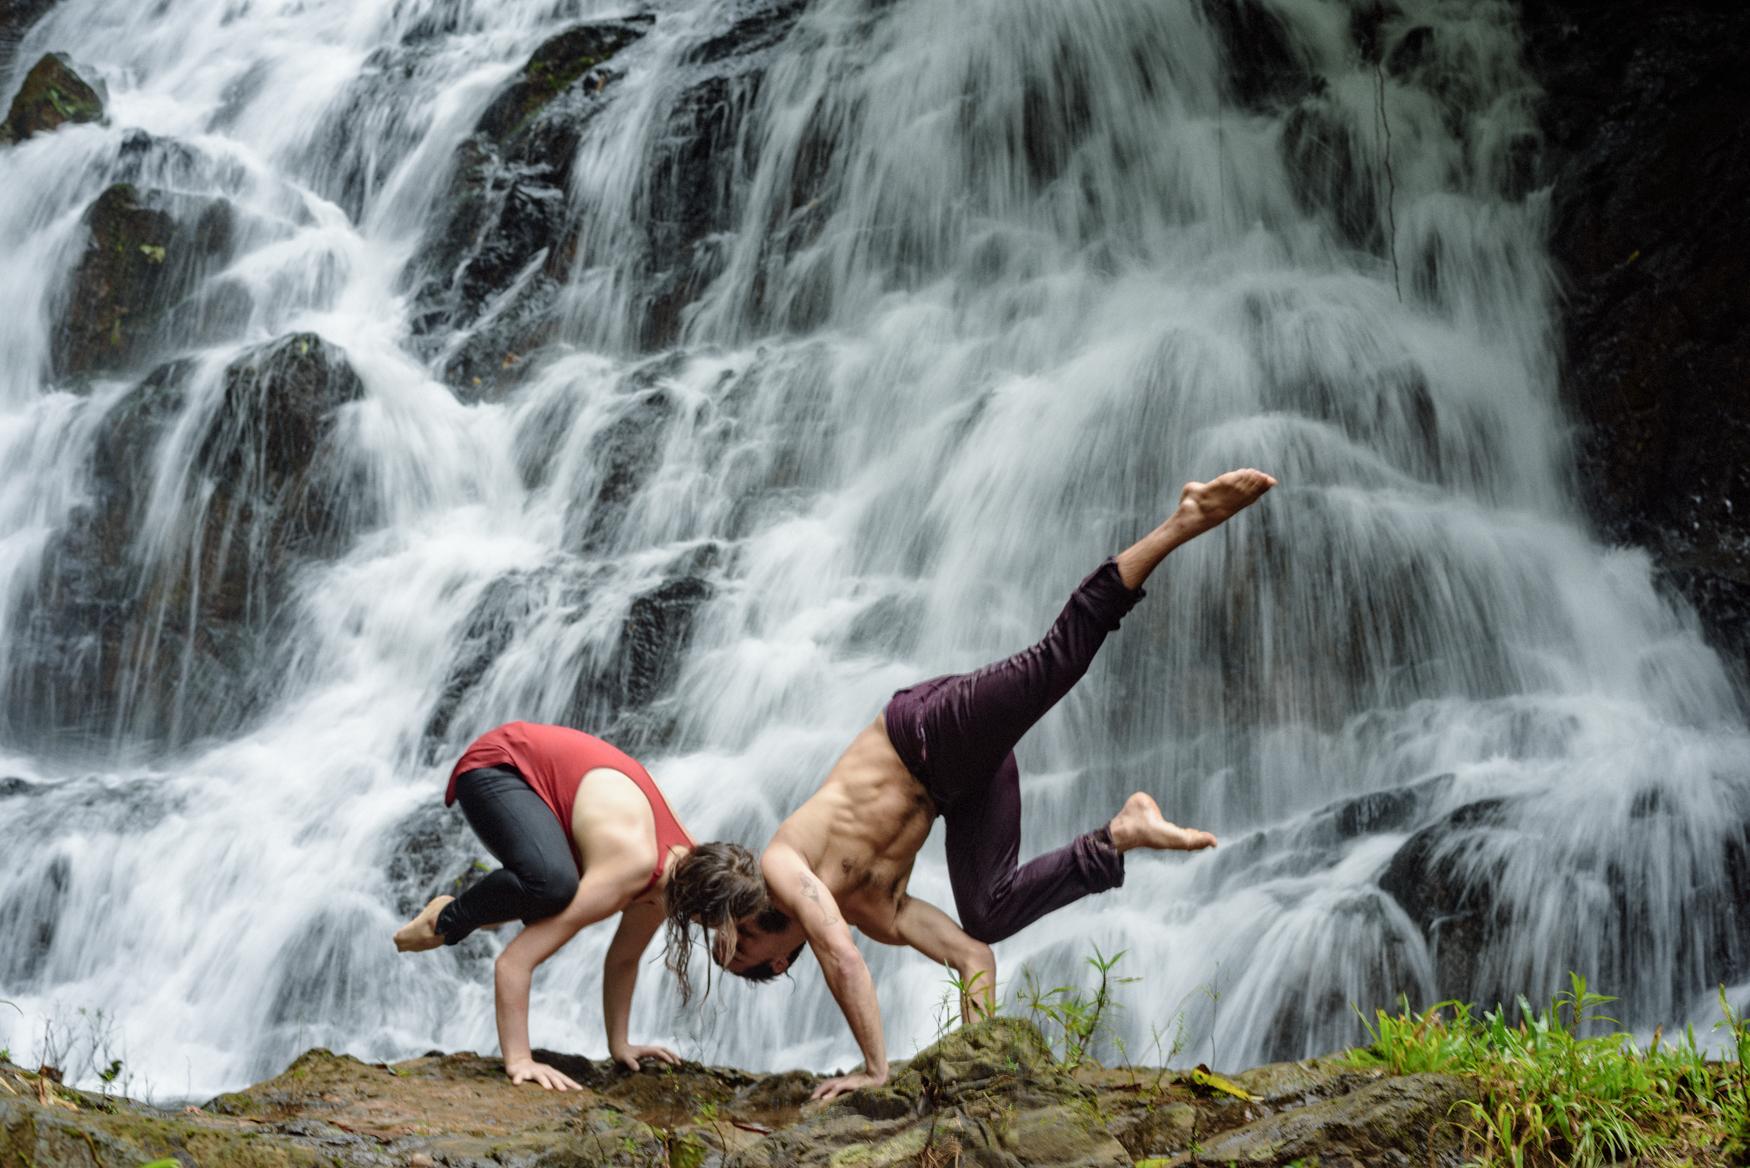 Yoga-Retreat-Photography-Costa-Rica-17.jpg